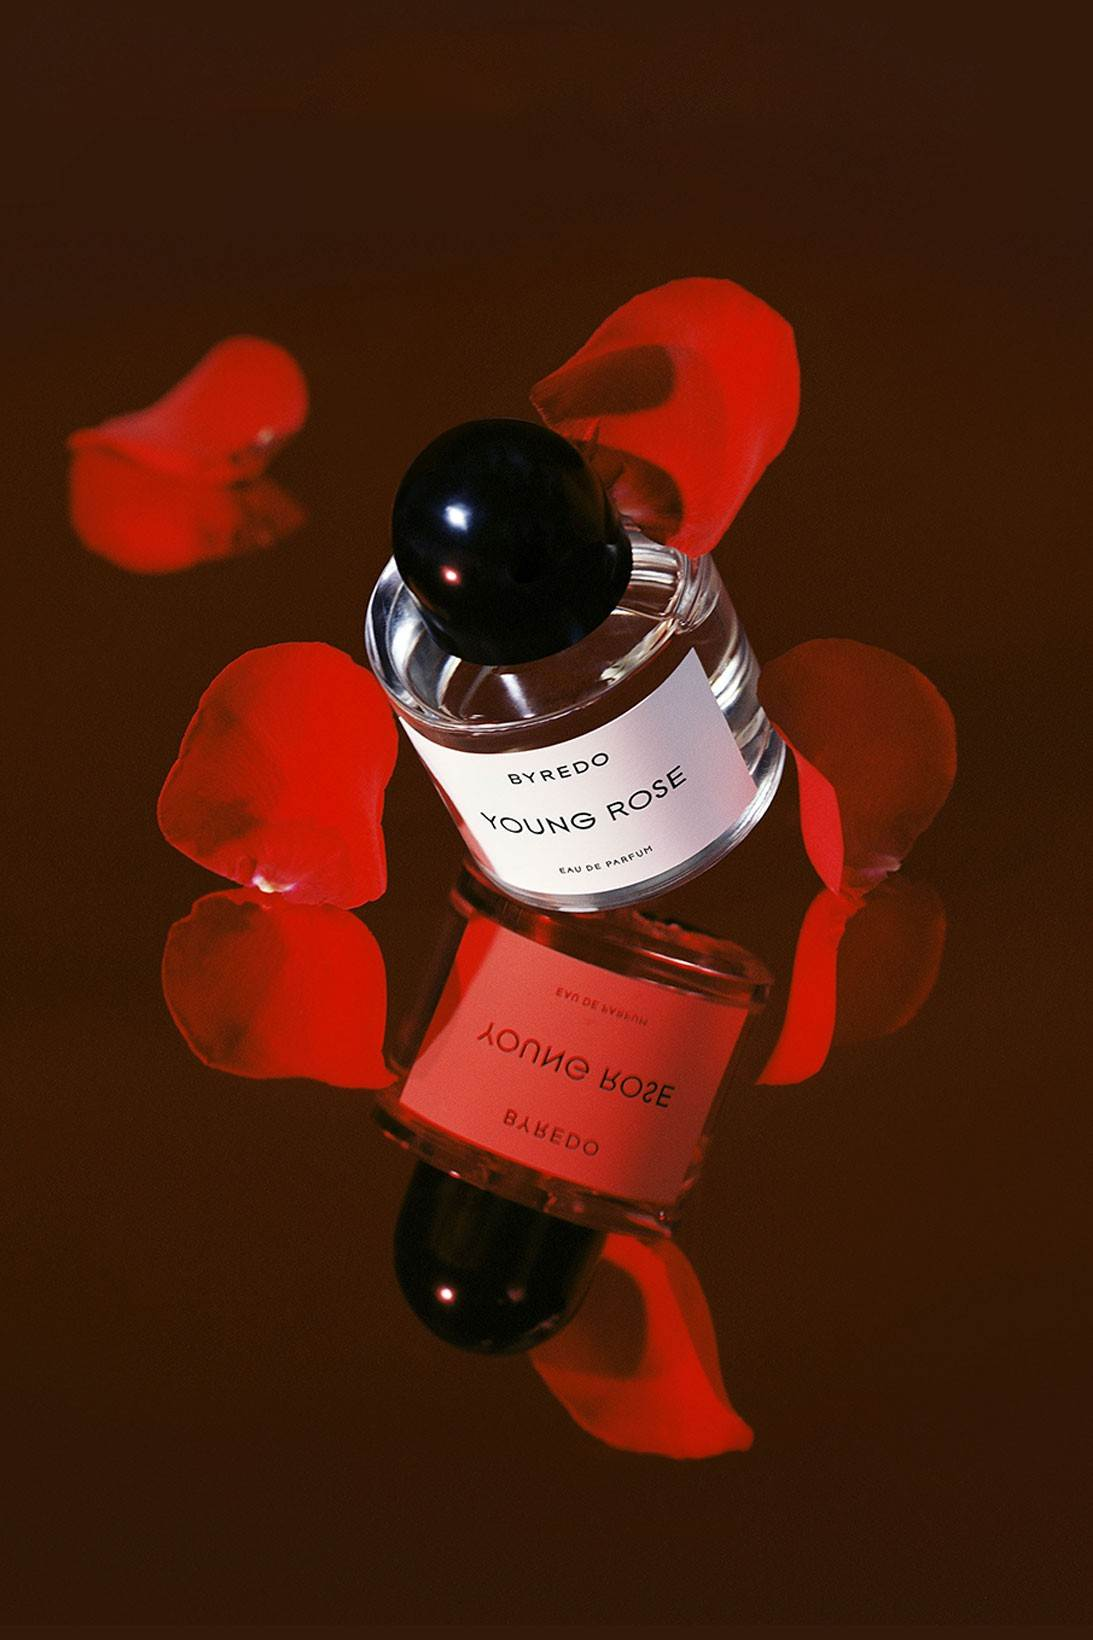 byredo-young-rose-fragrance-perfume-scent-ben-gorham-release-informat (1)